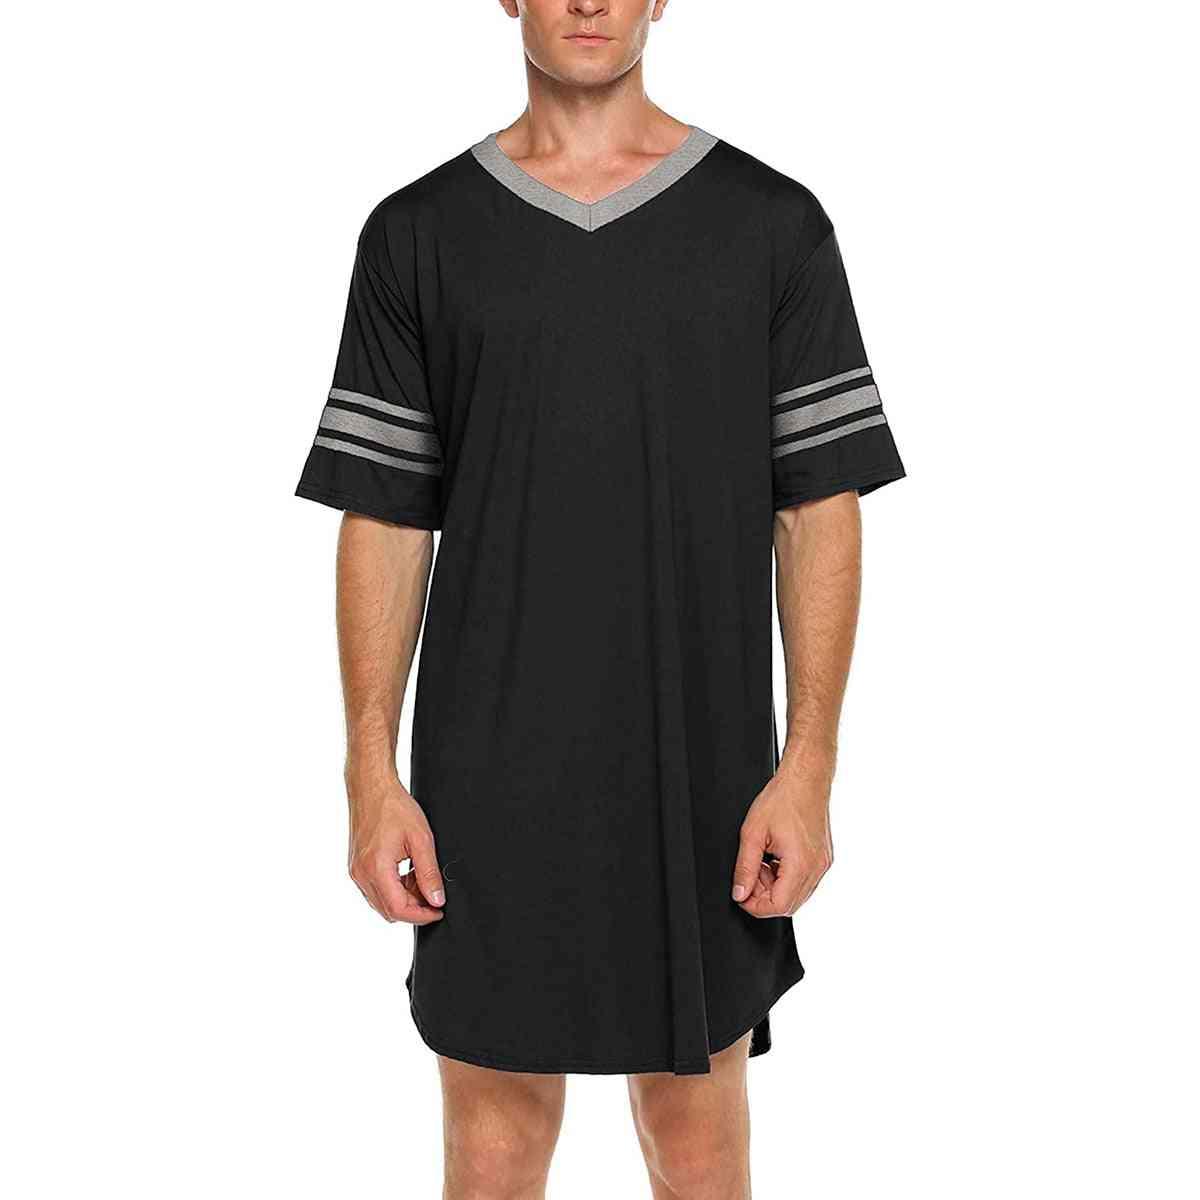 Men Cotton Casual Short Sleeve, Long Nightshirt Soft Loose Night Sleepwear